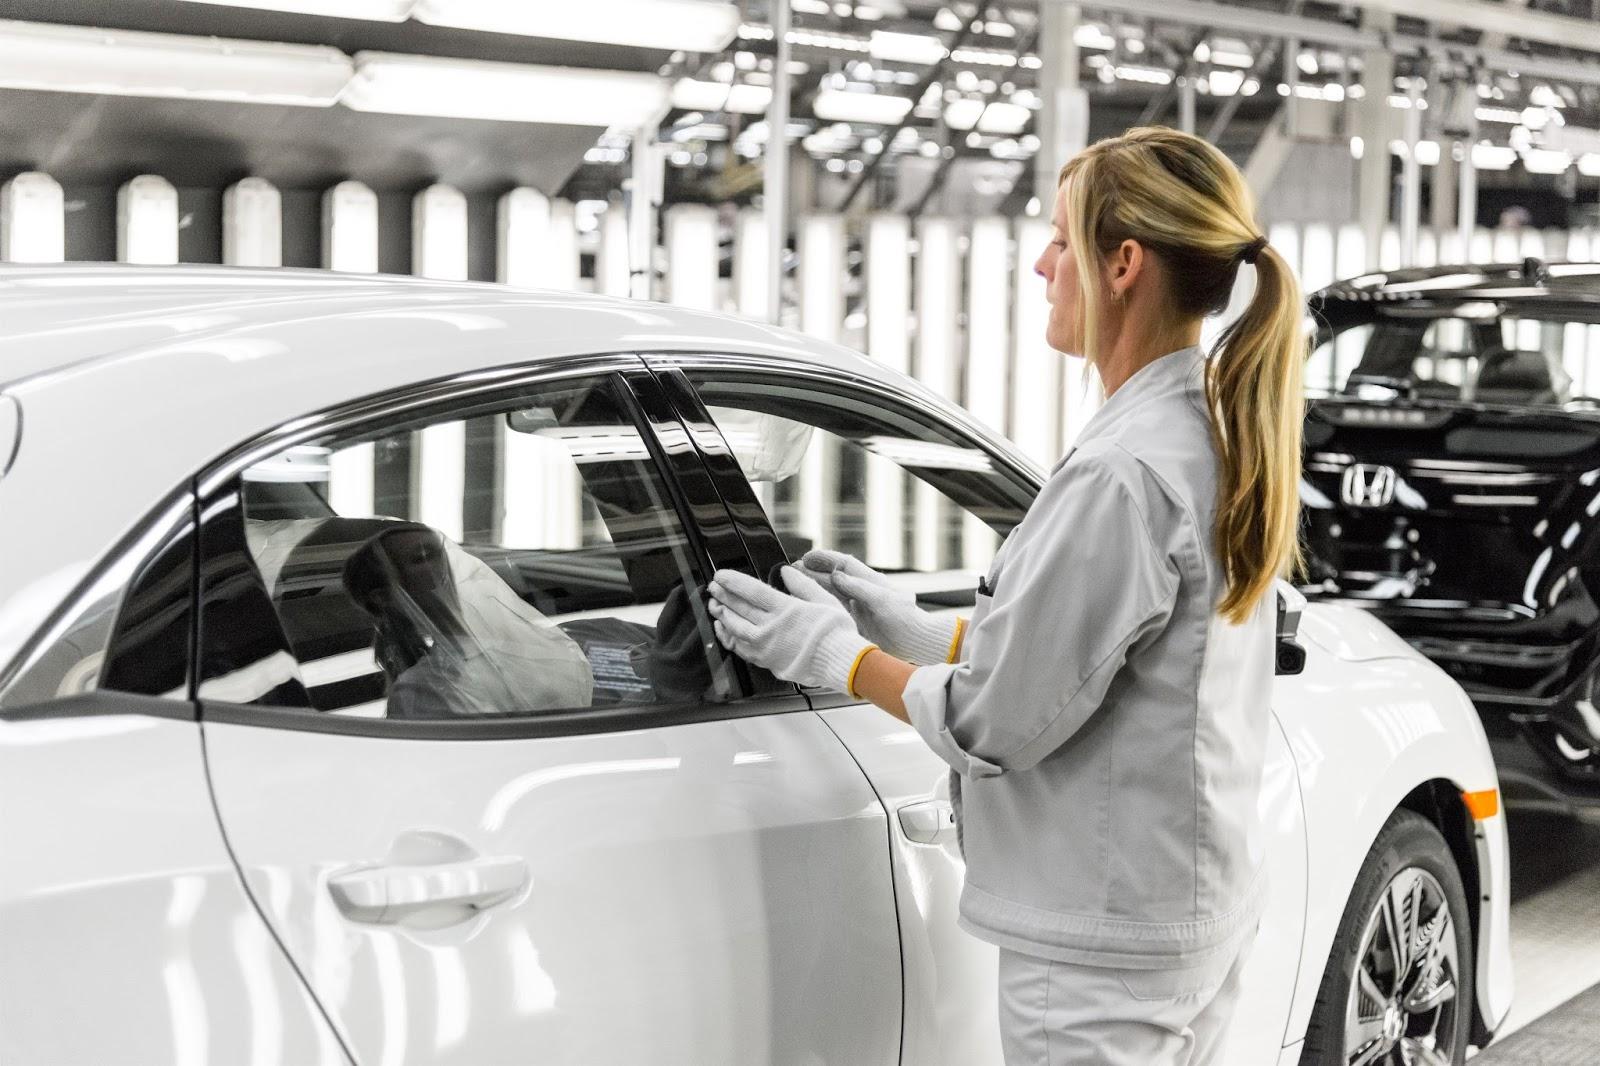 78277 Honda of the UK Manufacturing Η Honda επενδύει στο εργοστάσιο της, στην Αγγλία